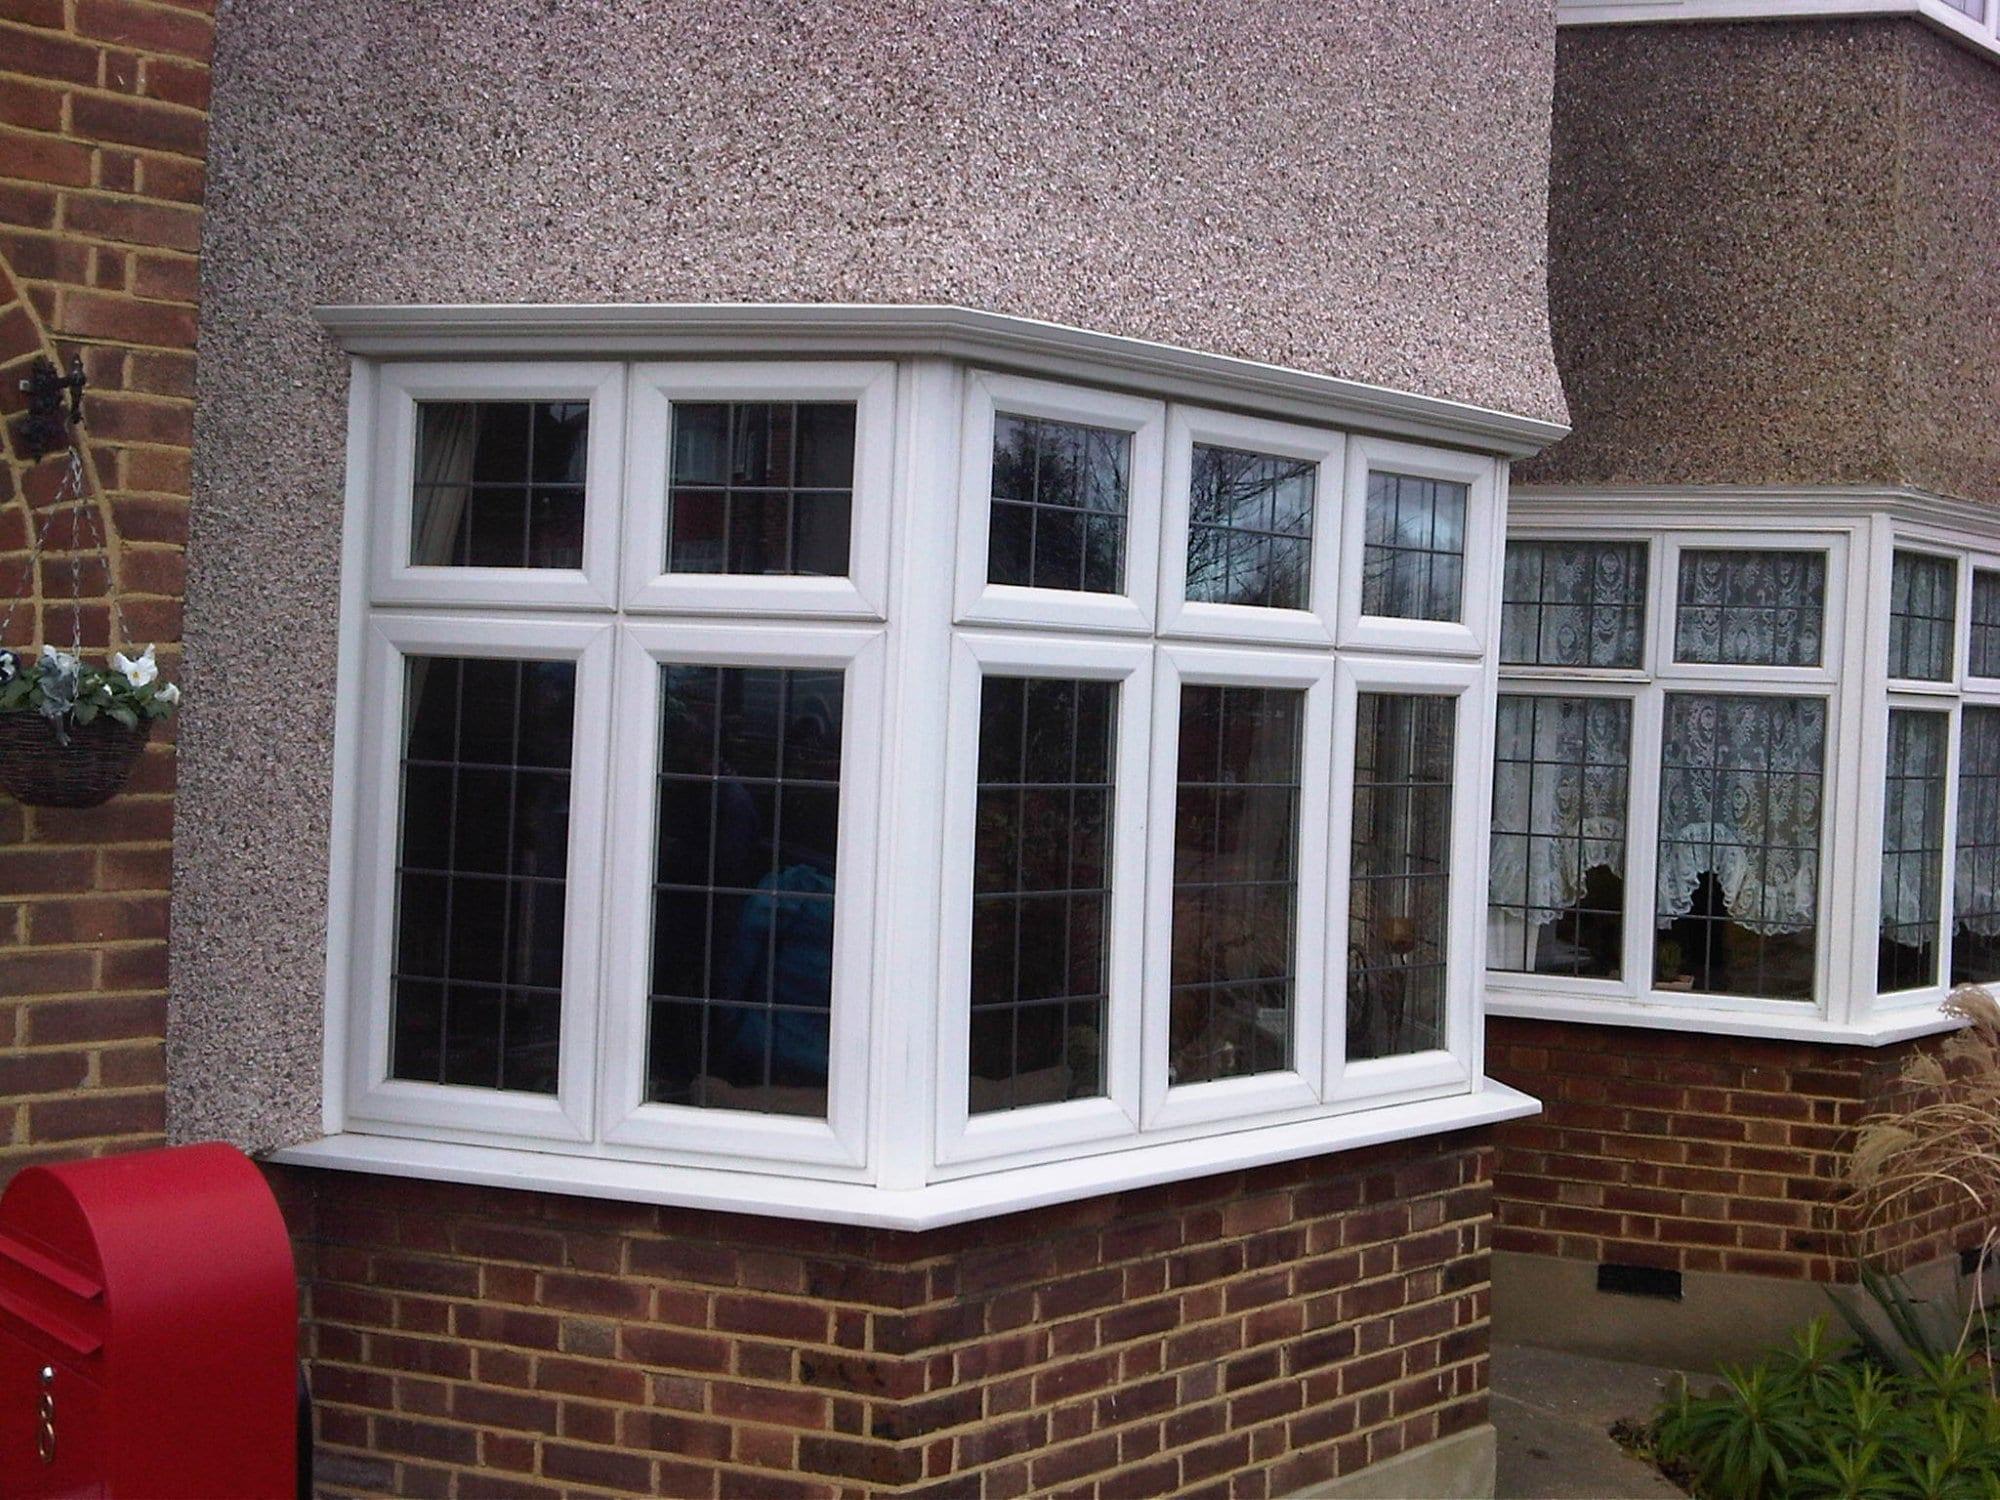 upvc bay windows surrey - Express Supply Only Double Glazing Service